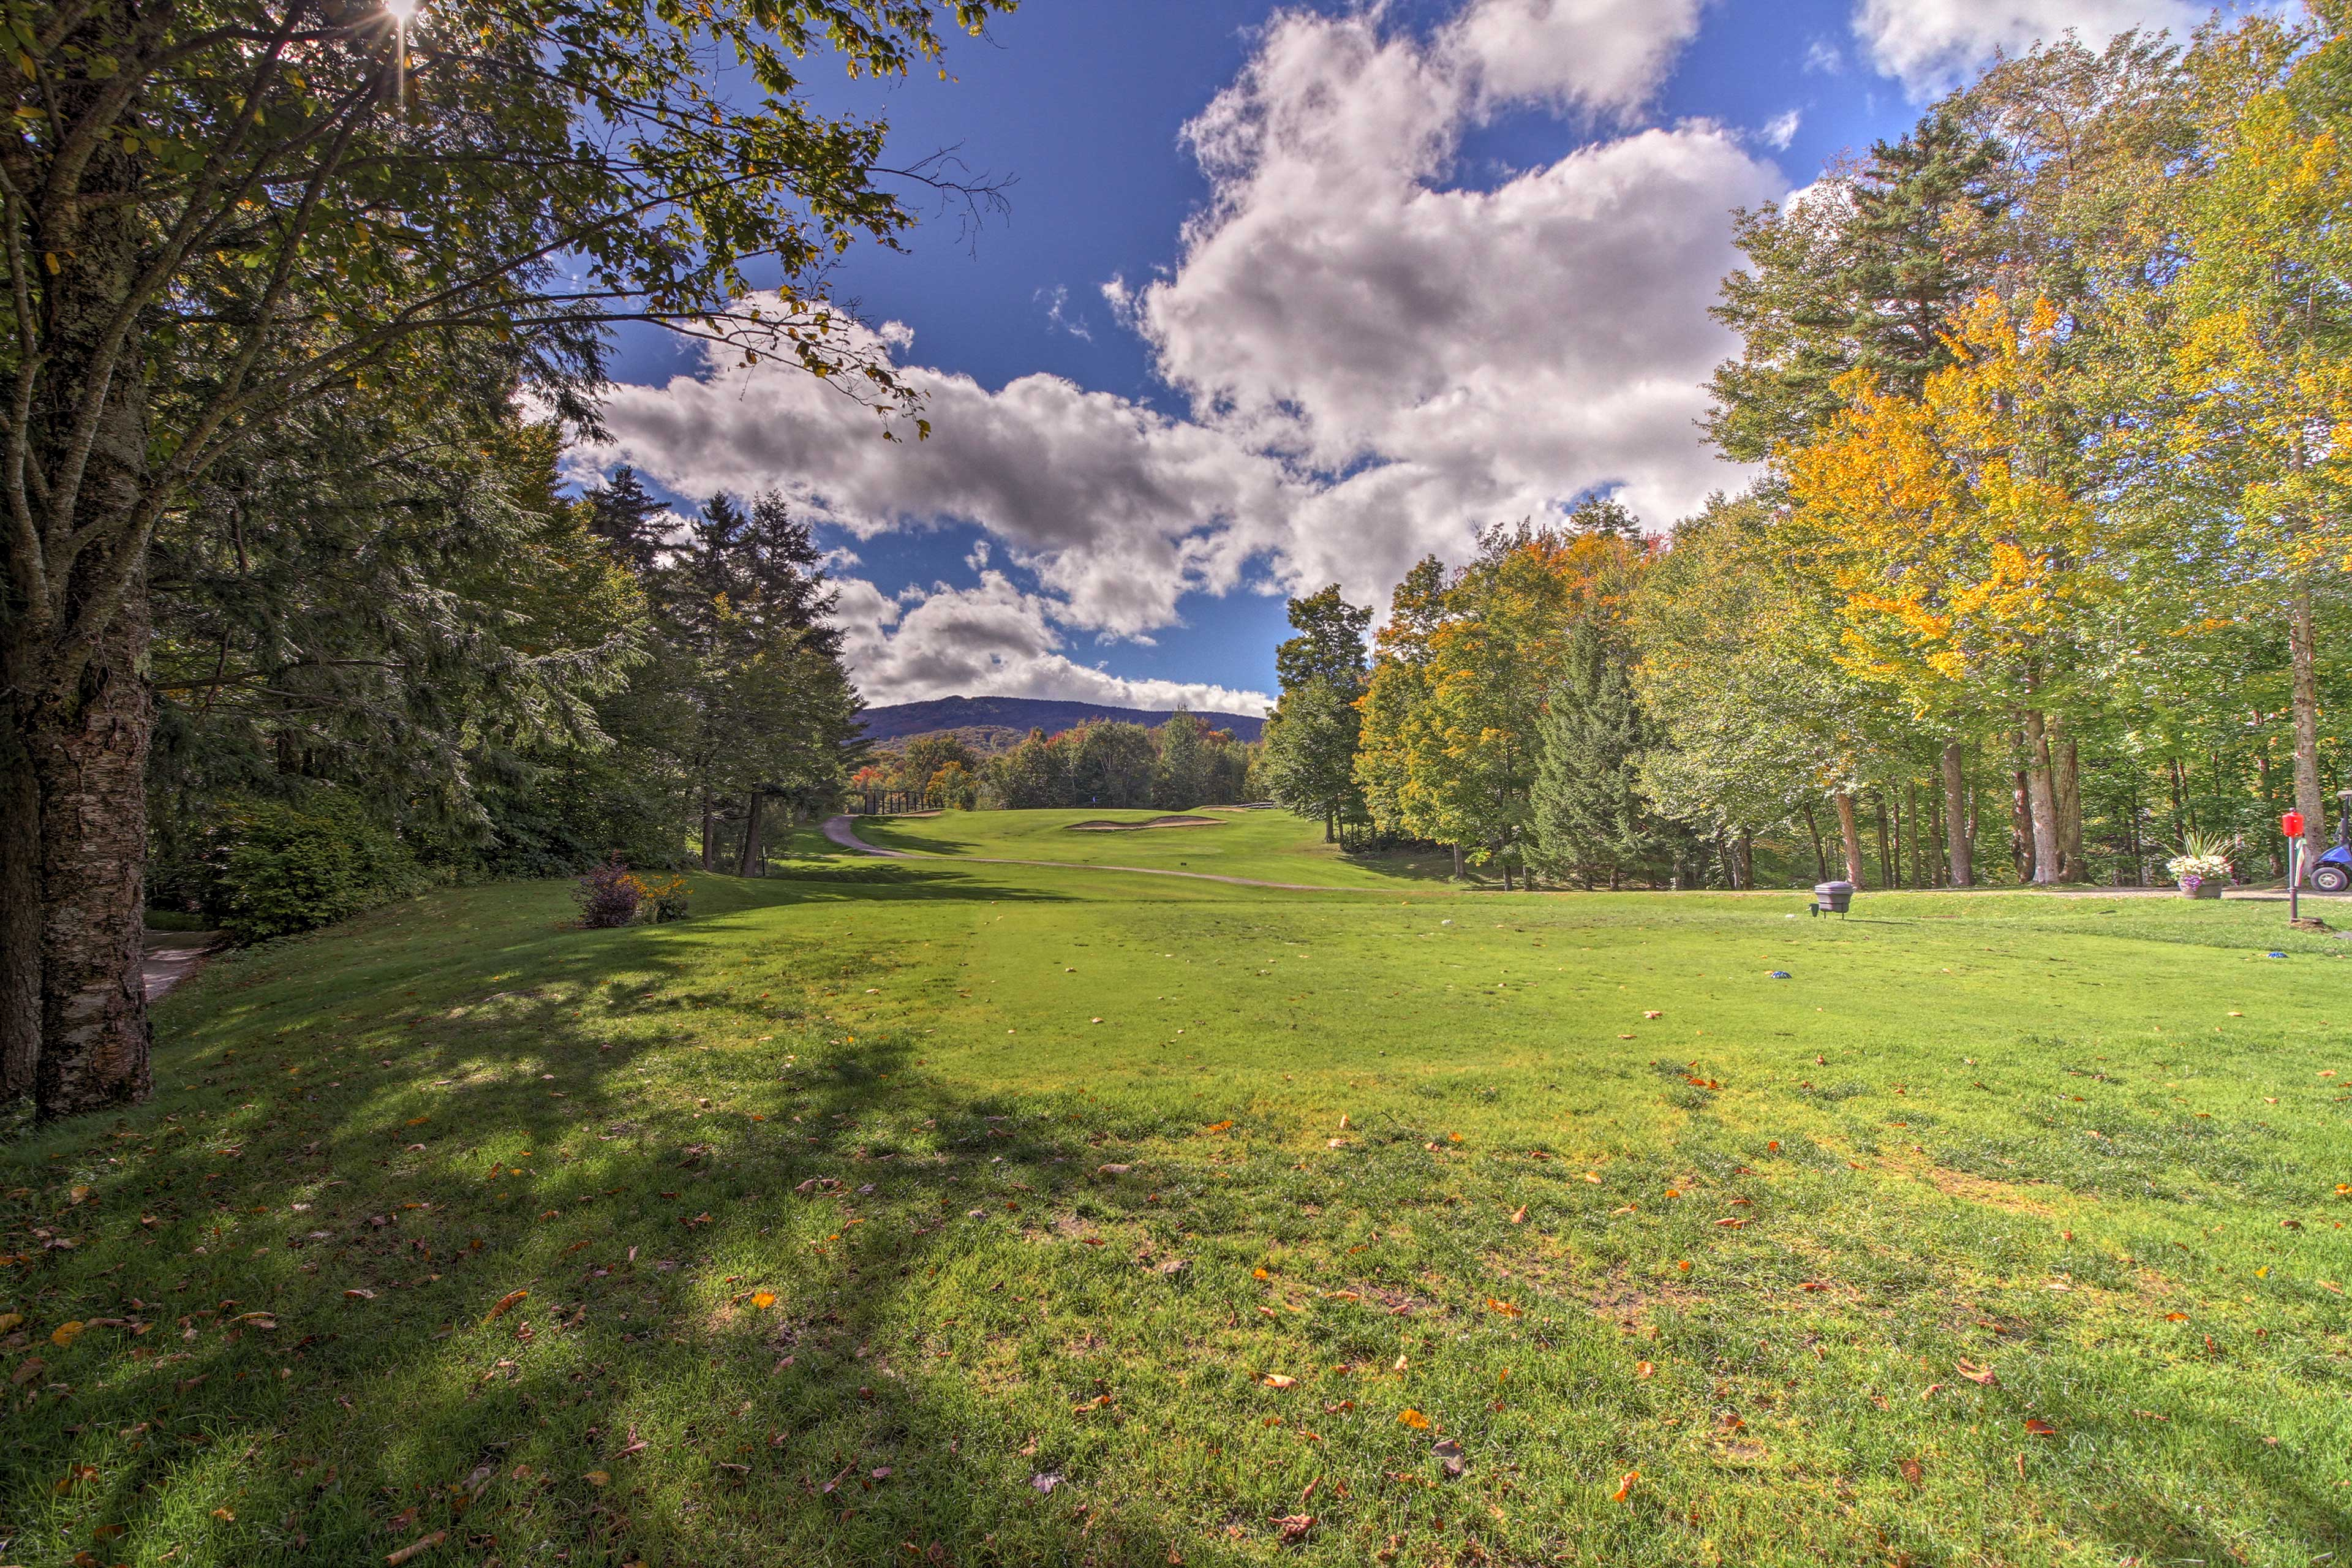 Killington Golf Course (3.5 miles)